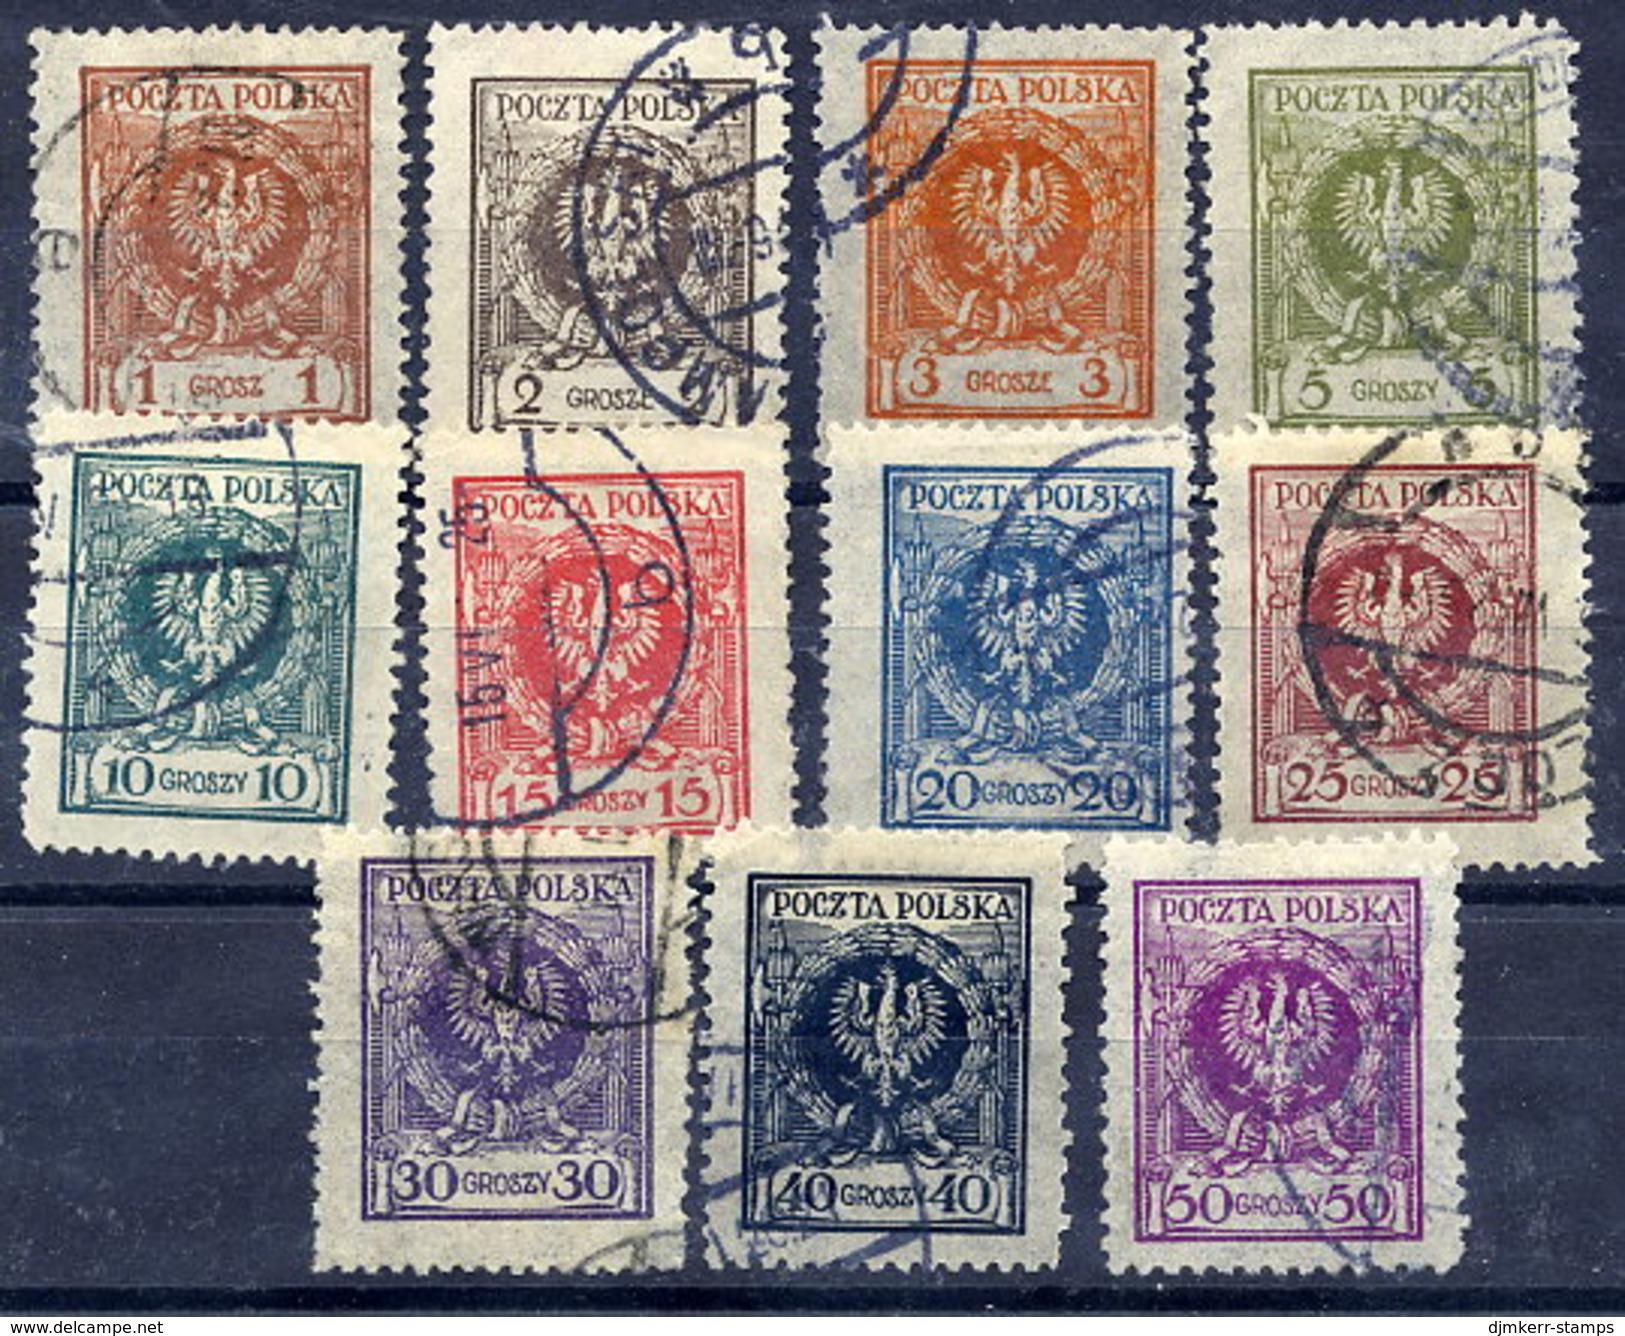 POLAND 1924 Eagle In Wreath Definitive Set Used.  Michel 201-11 - 1919-1939 Republic